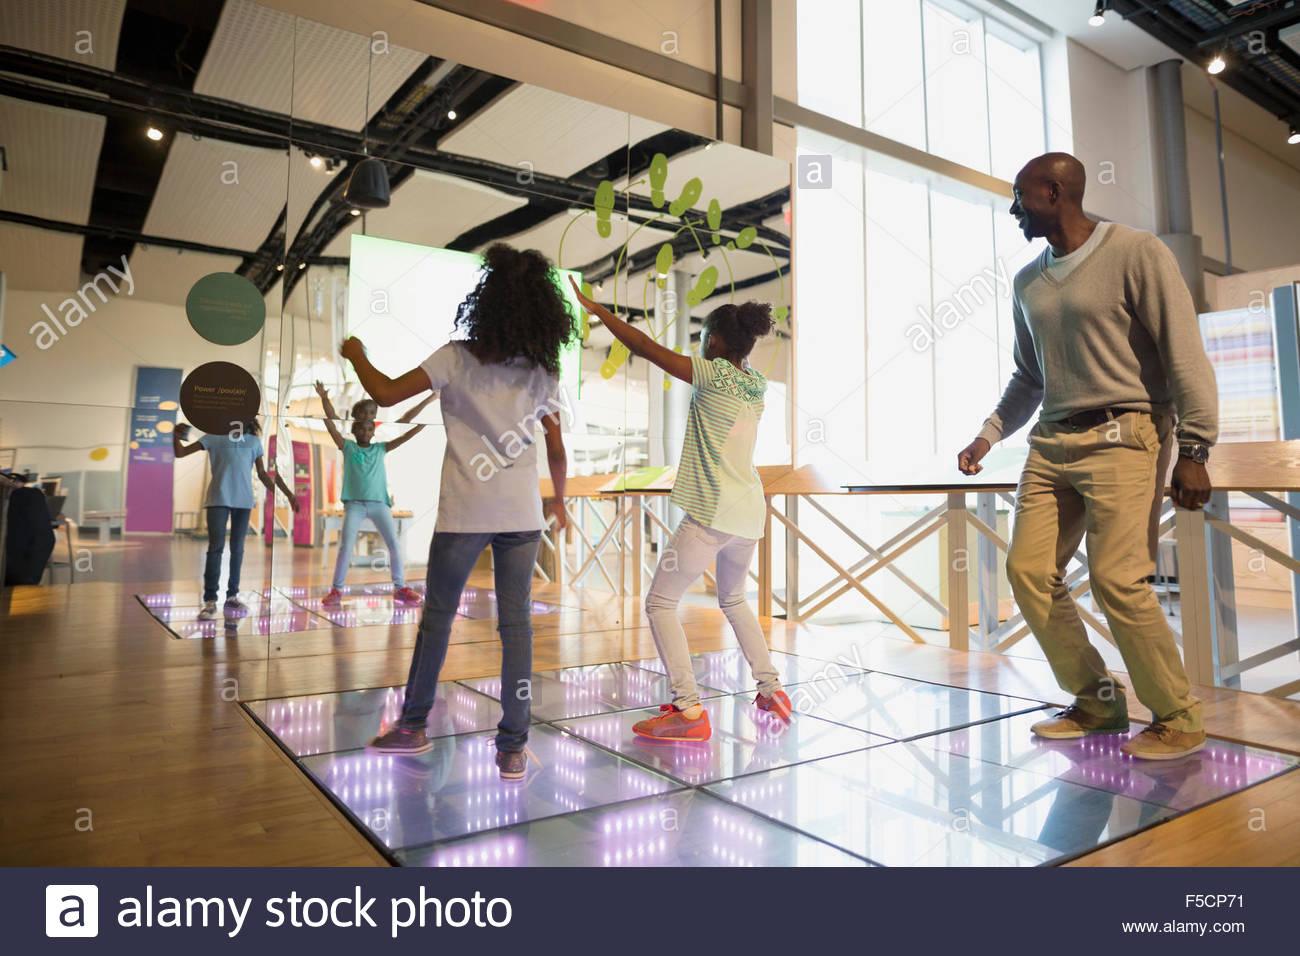 Vater beobachtete Töchter Tanz im Science center Stockbild